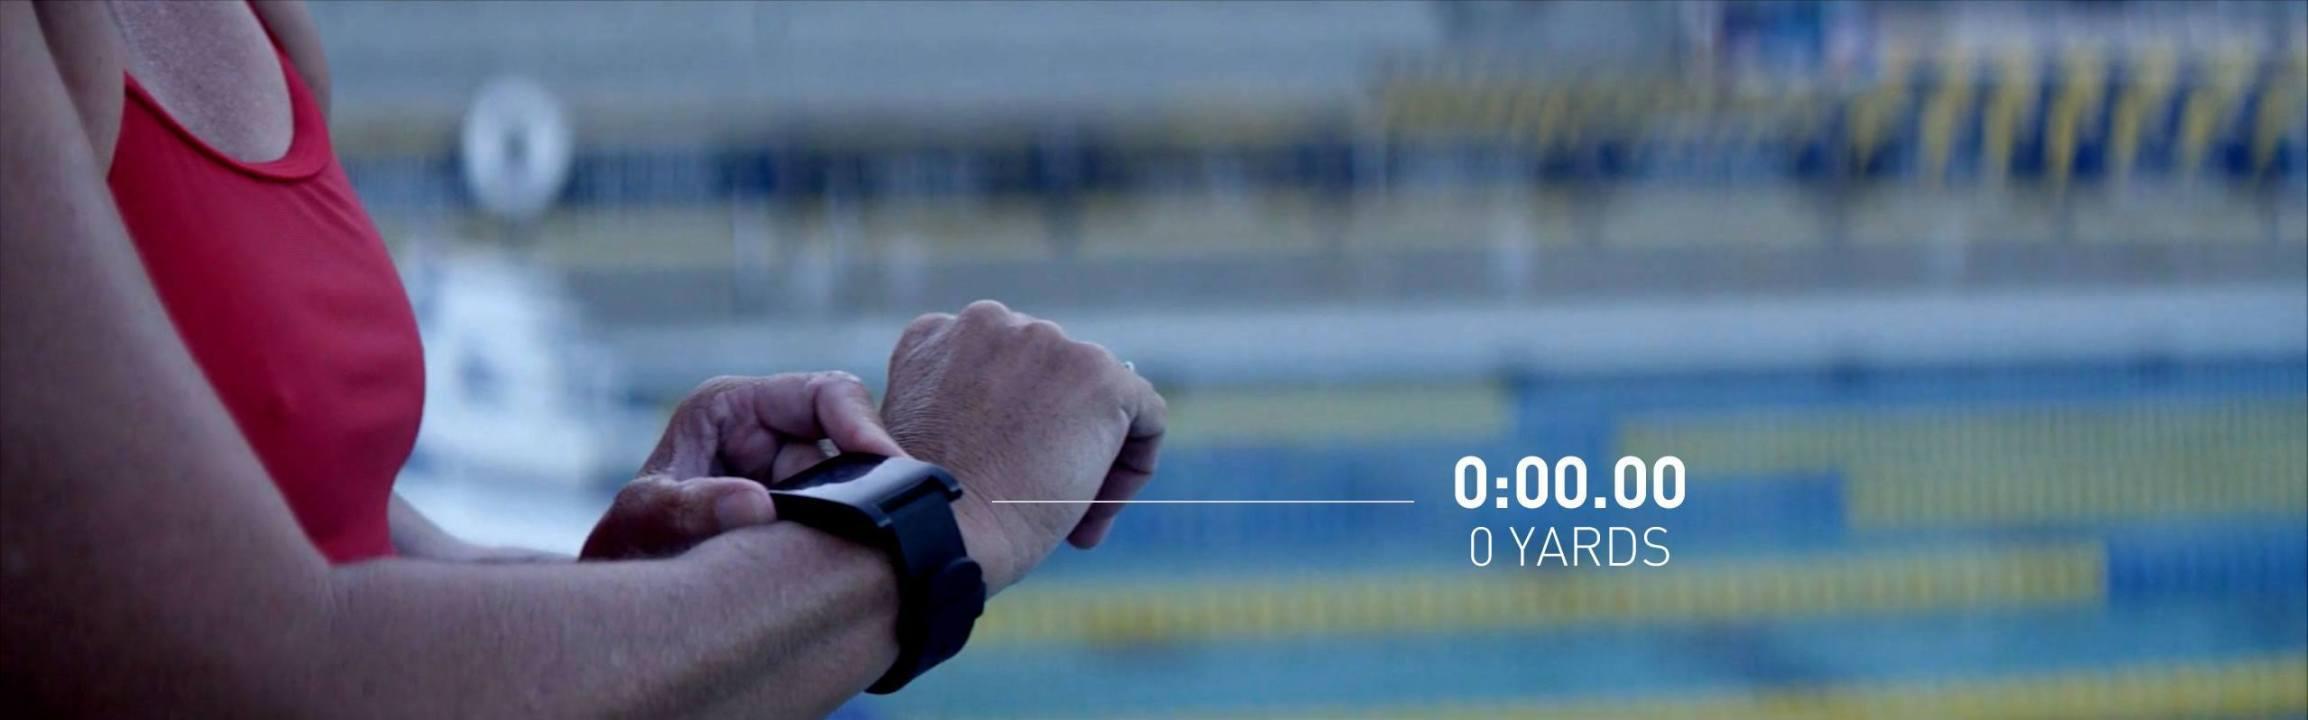 Testing the Pebble Watch on Swim.com